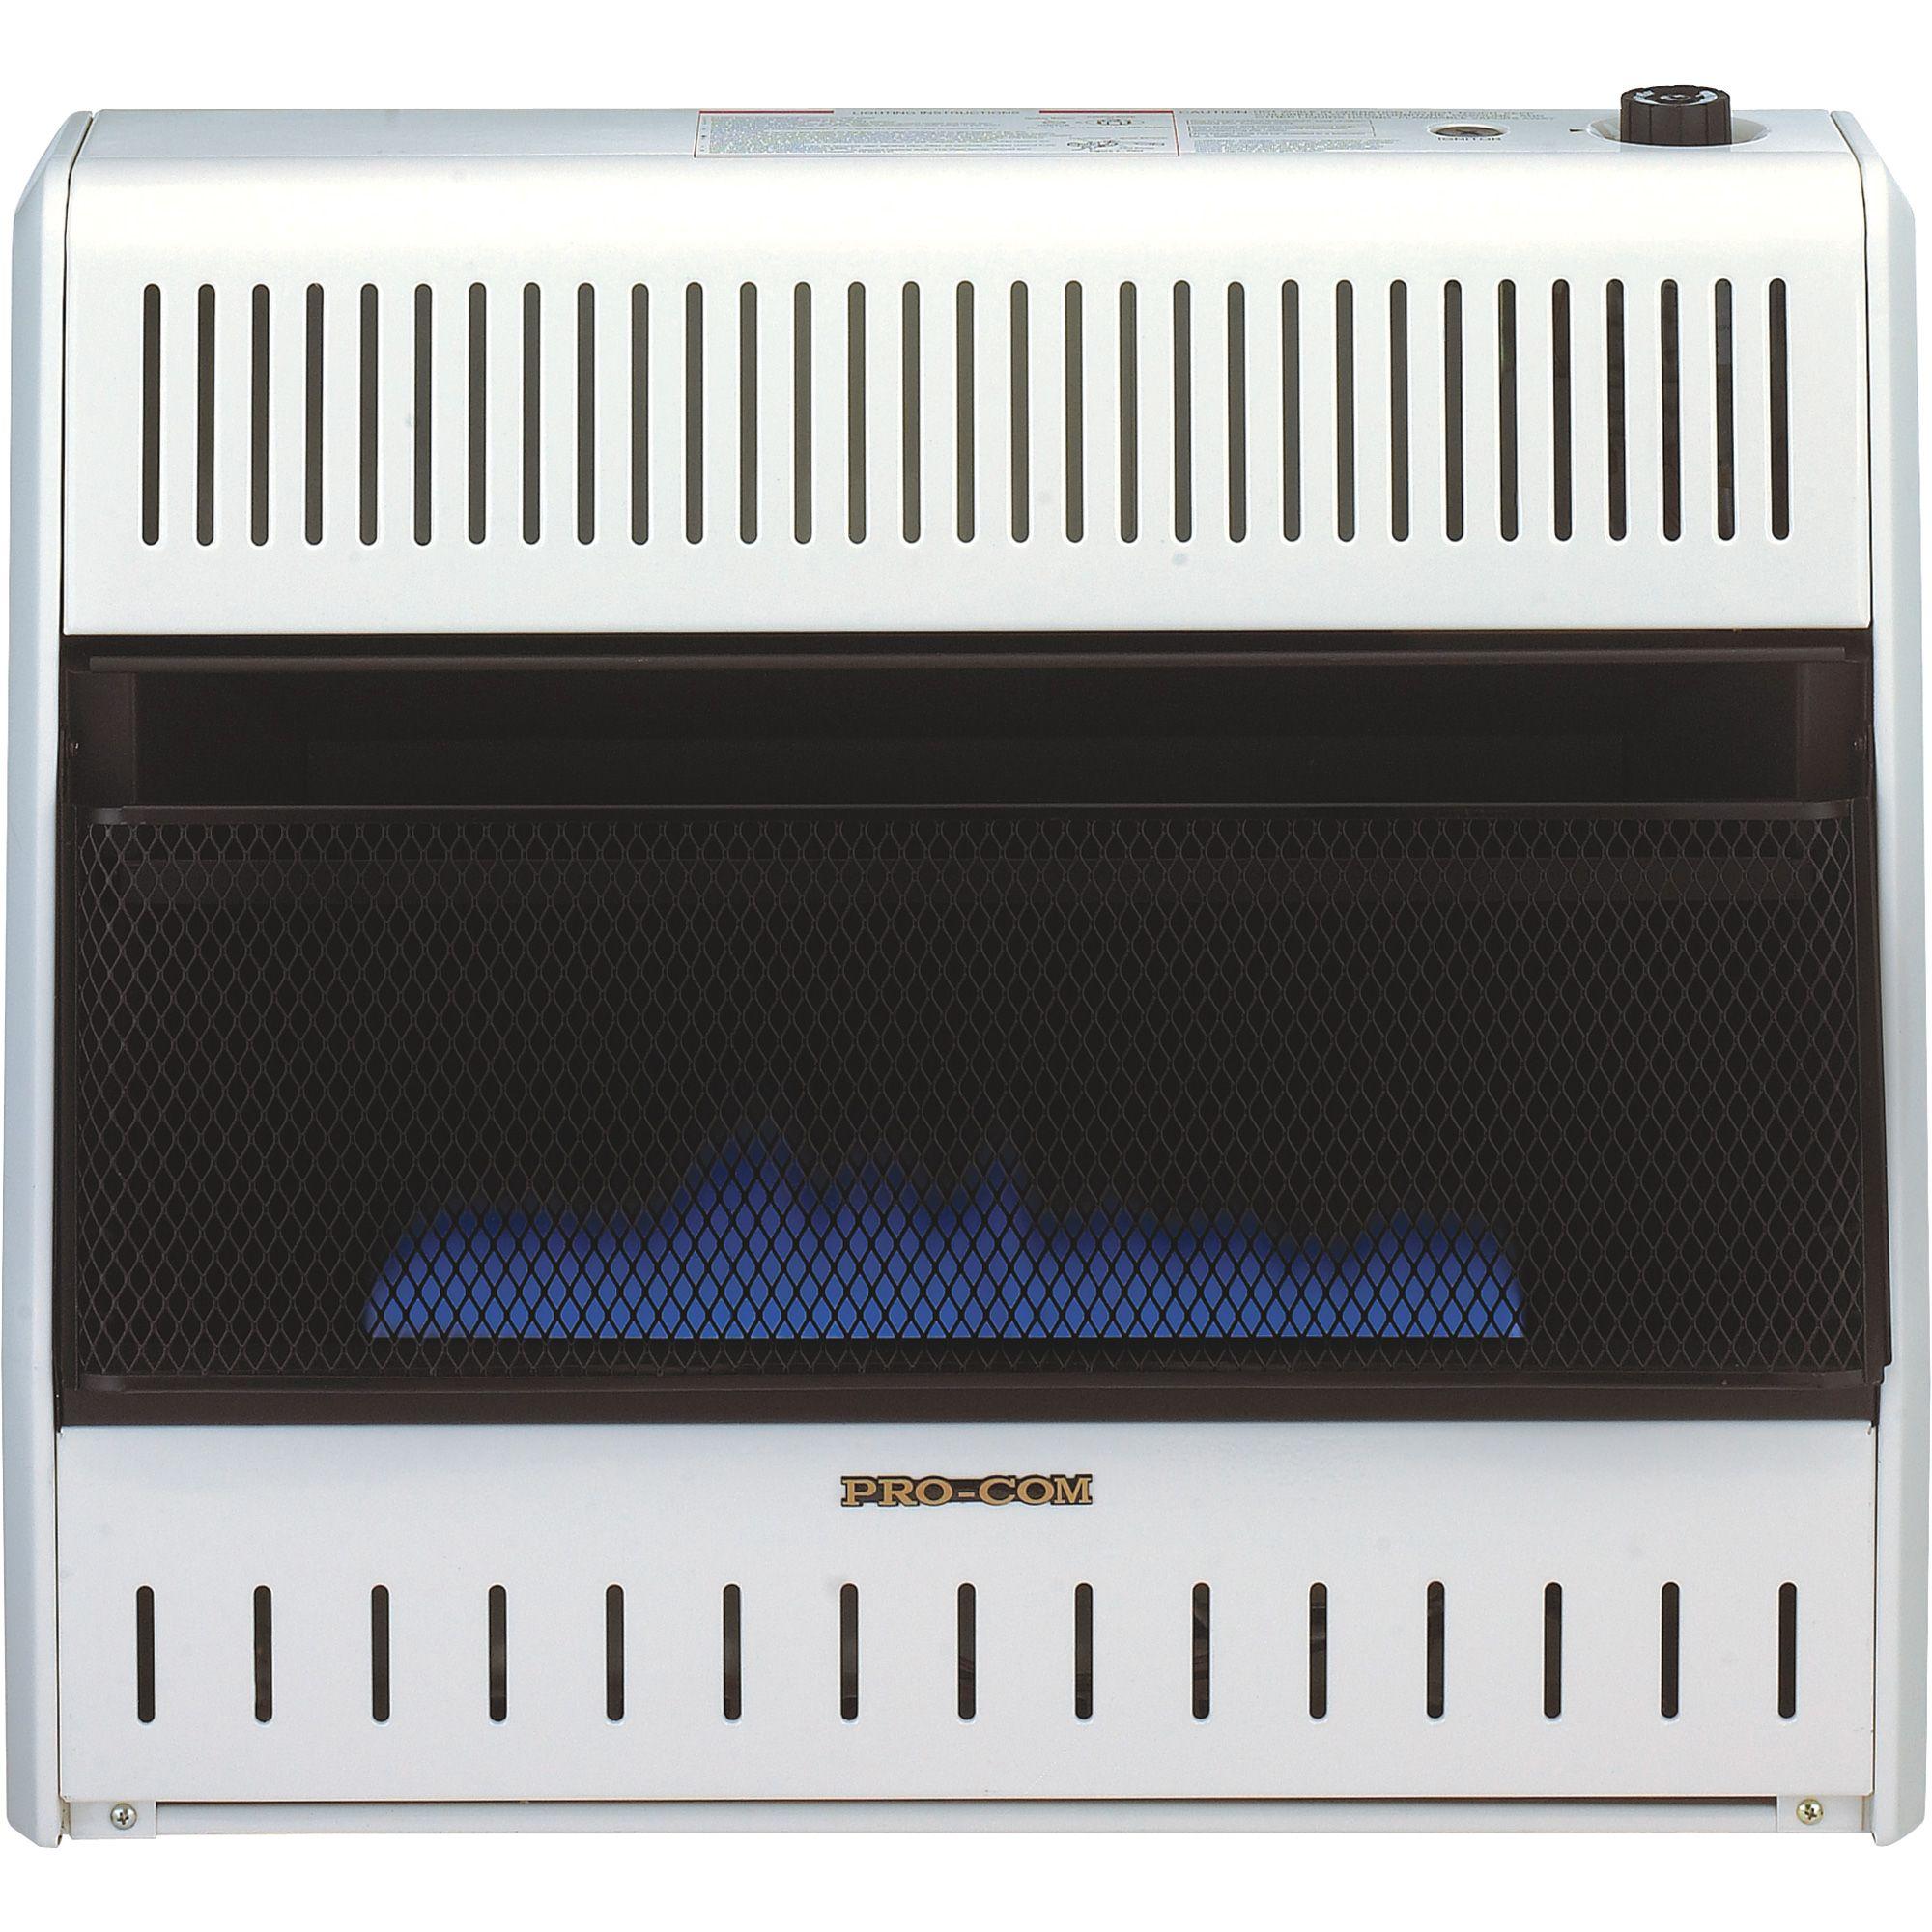 ProCom Vent-Free Dual Fuel Blue Flame Wall Heater